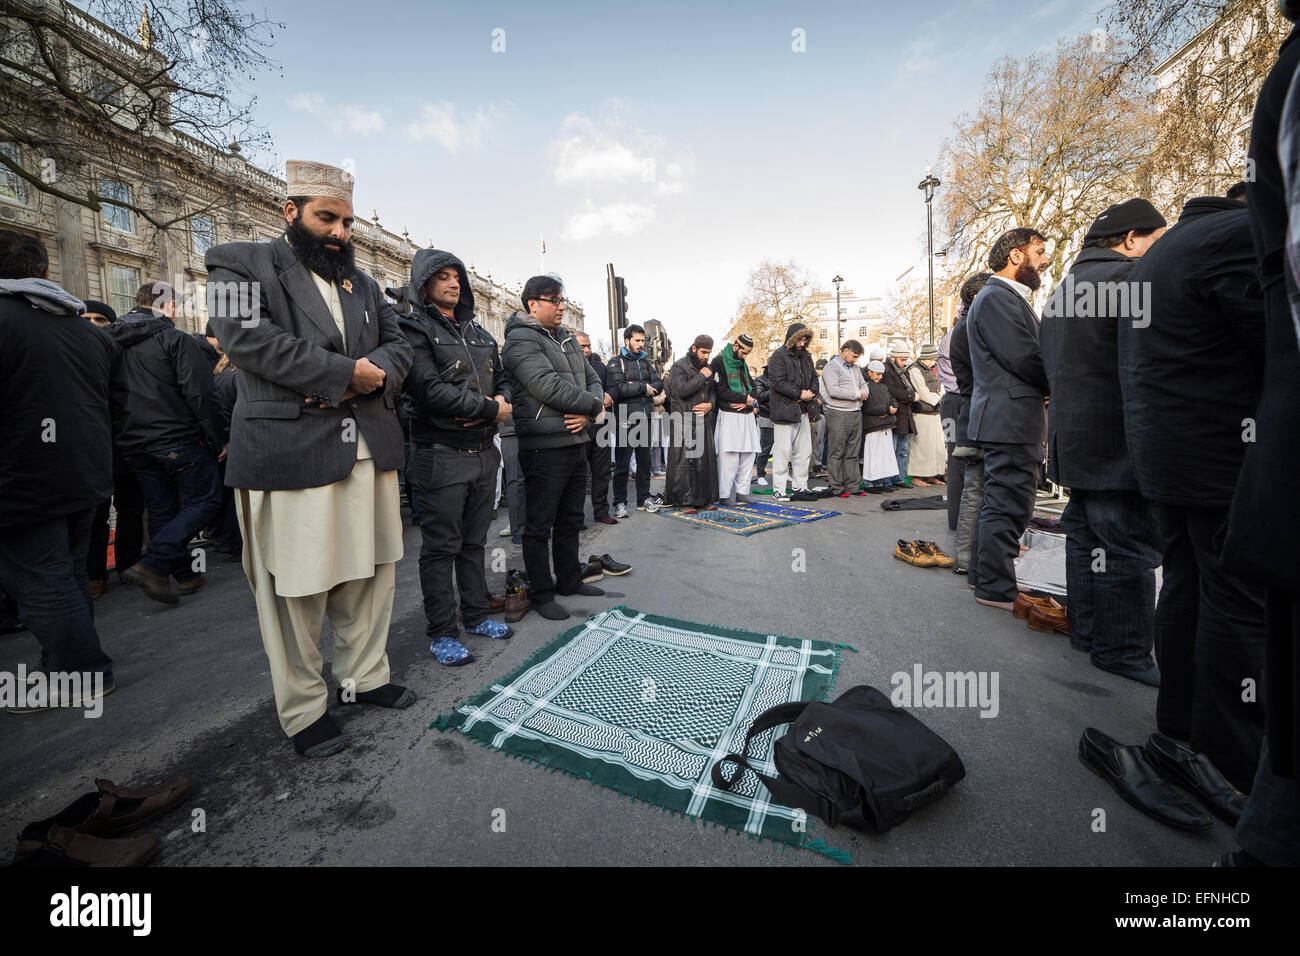 London, UK. 8th Feb, 2015. British Muslims noon-prayers on Whitehall. Credit:  Guy Corbishley/Alamy Live News - Stock Image